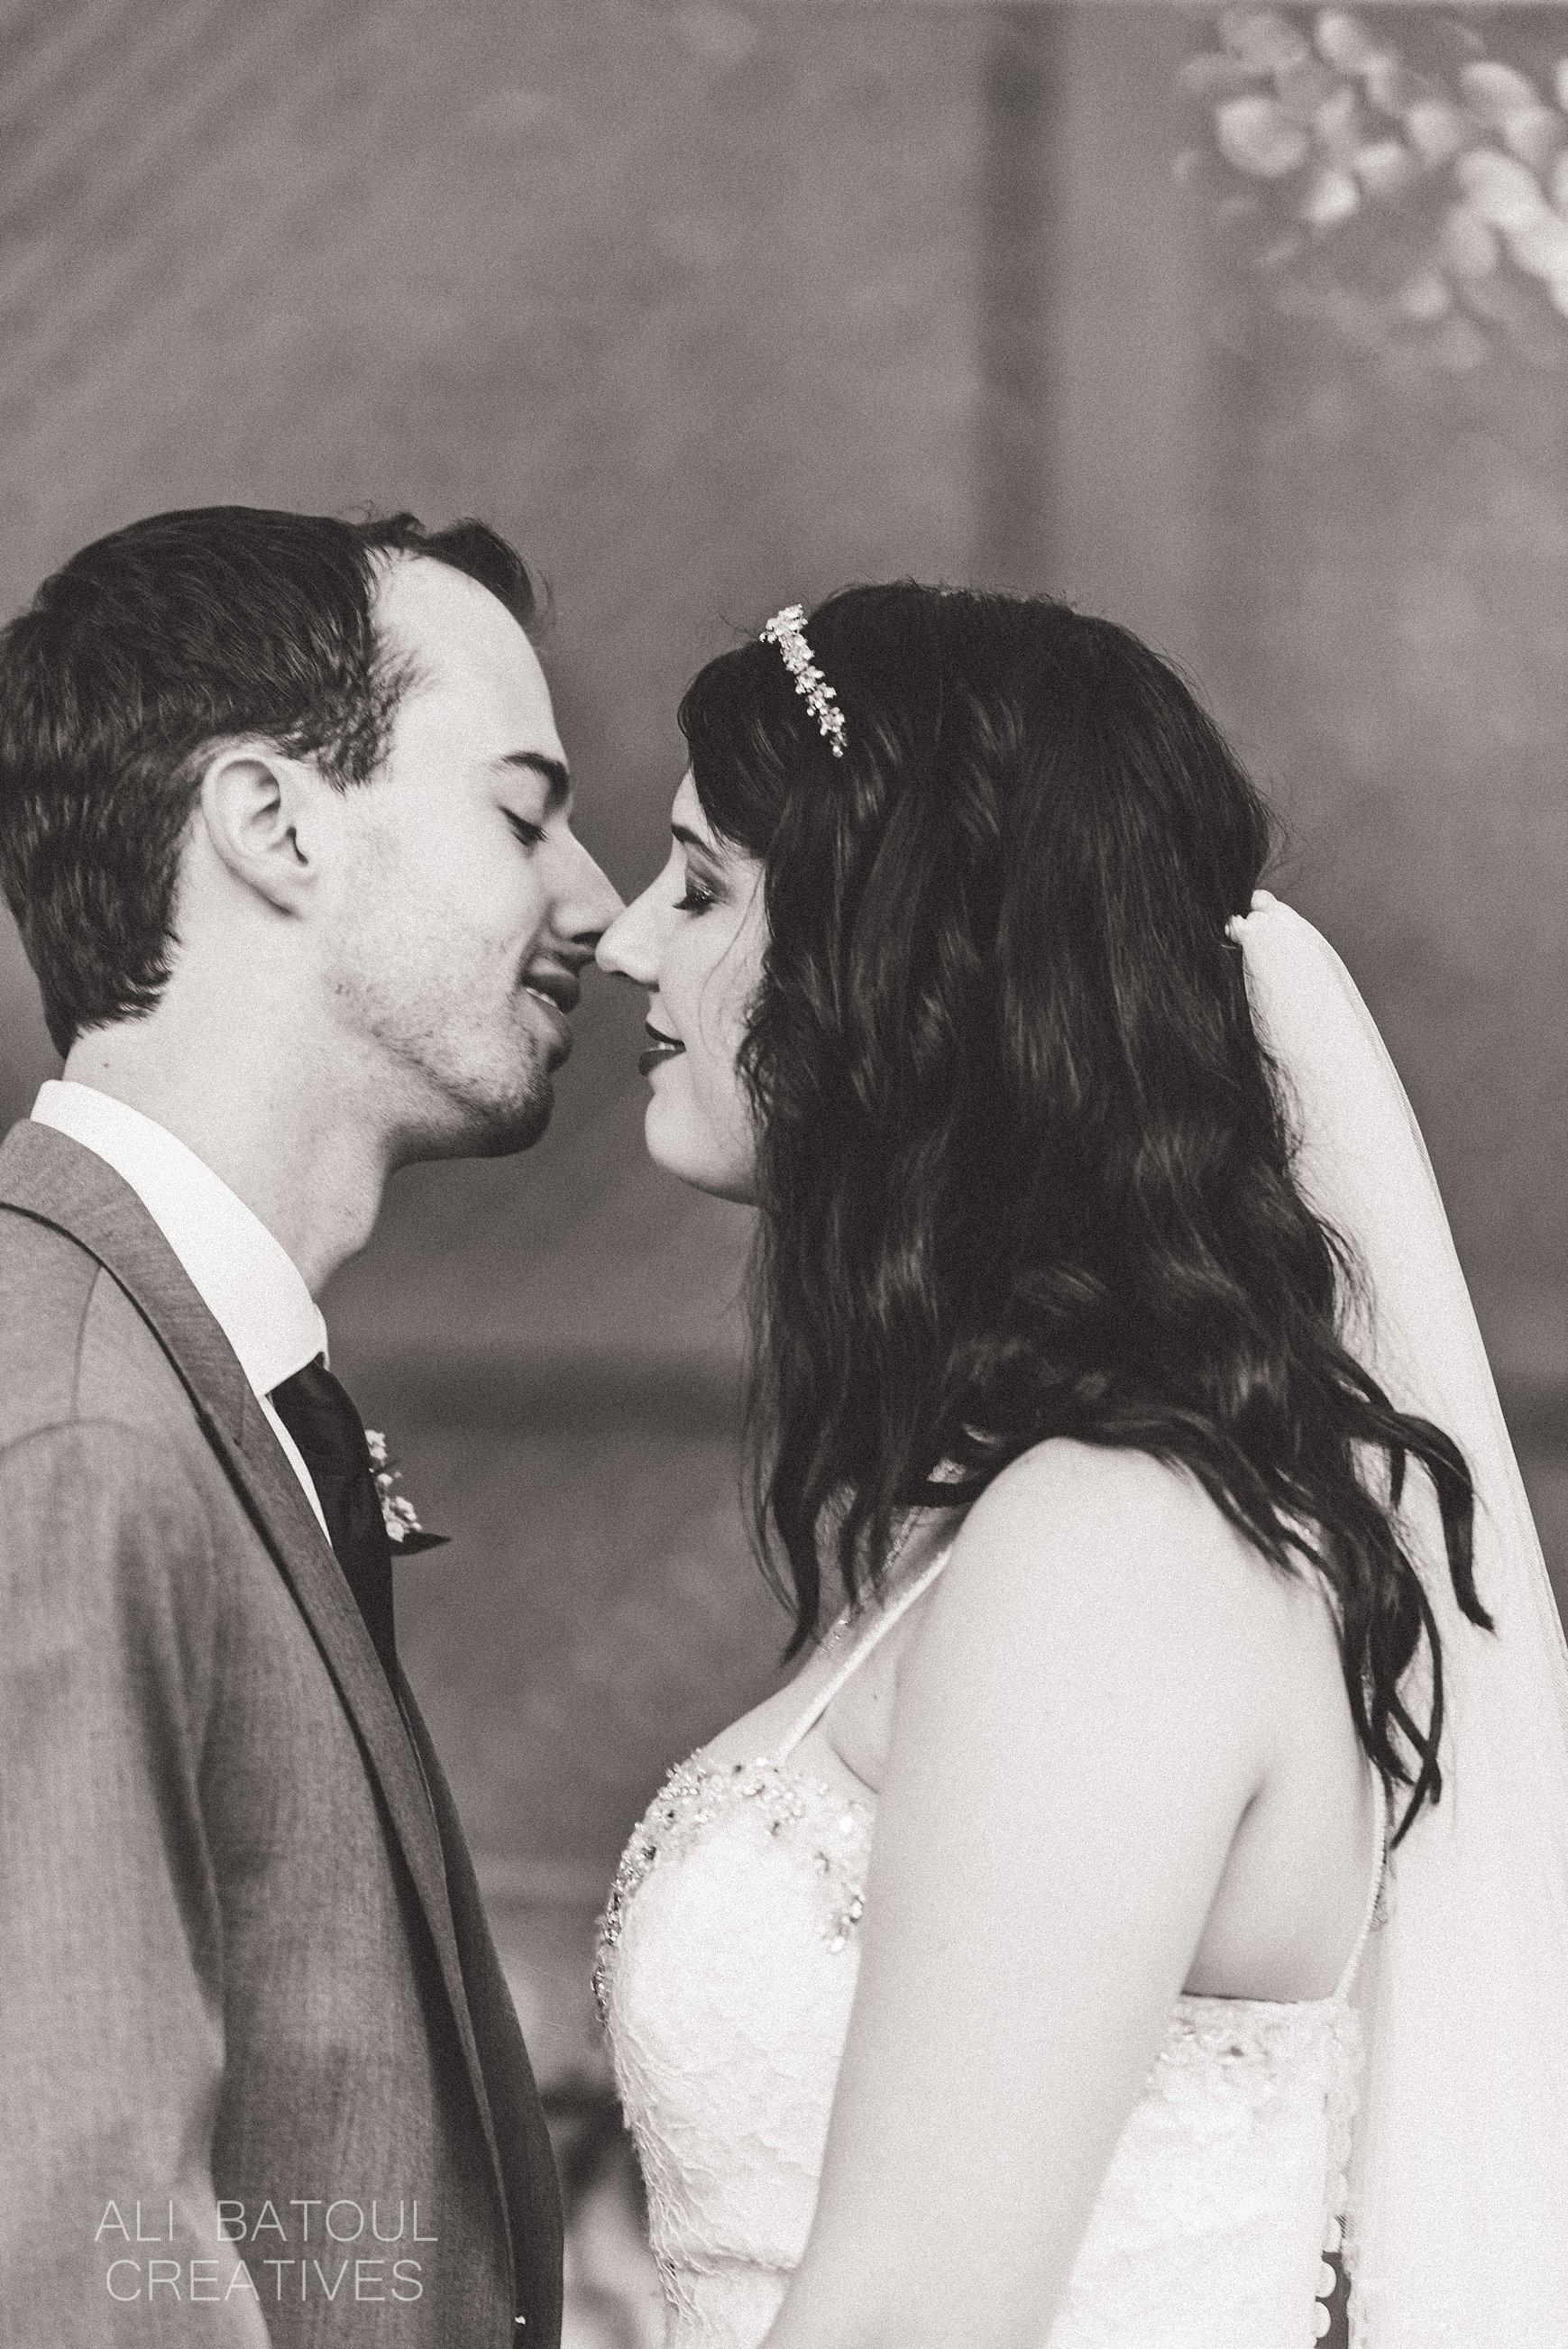 Jocelyn + Steve At The Schoolhouse Wedding - Ali and Batoul Fine Art Wedding Photography_0045.jpg